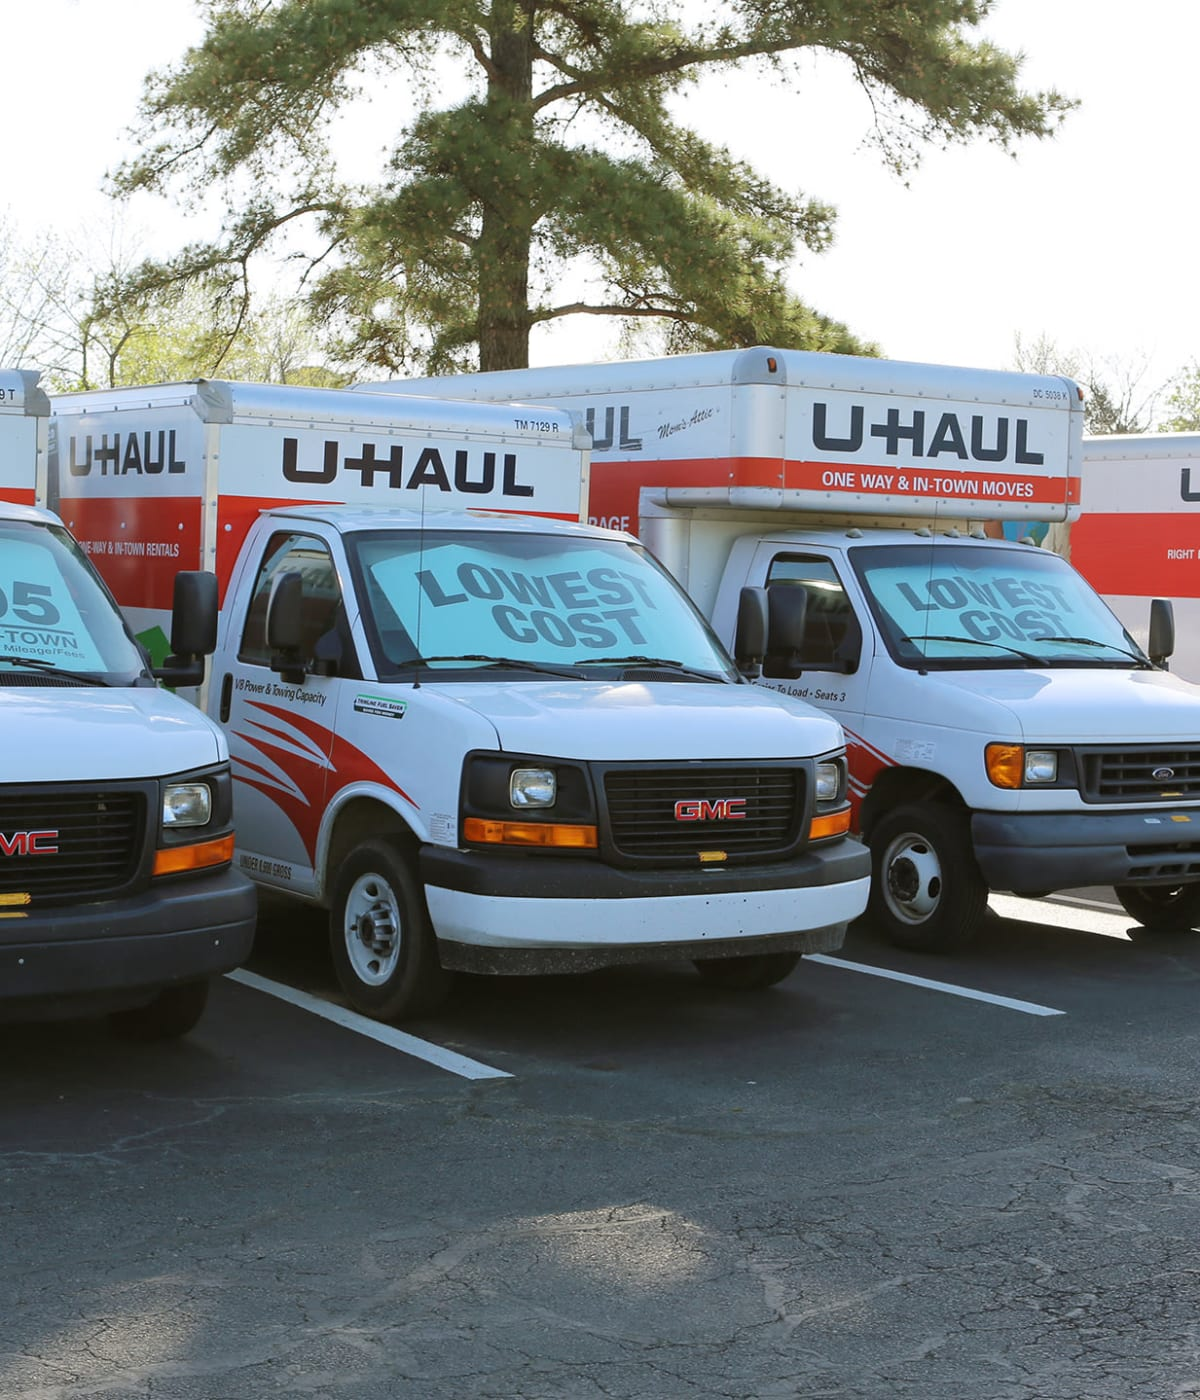 Midgard Self Storage in Brevard, North Carolina, has moving trucks for rent